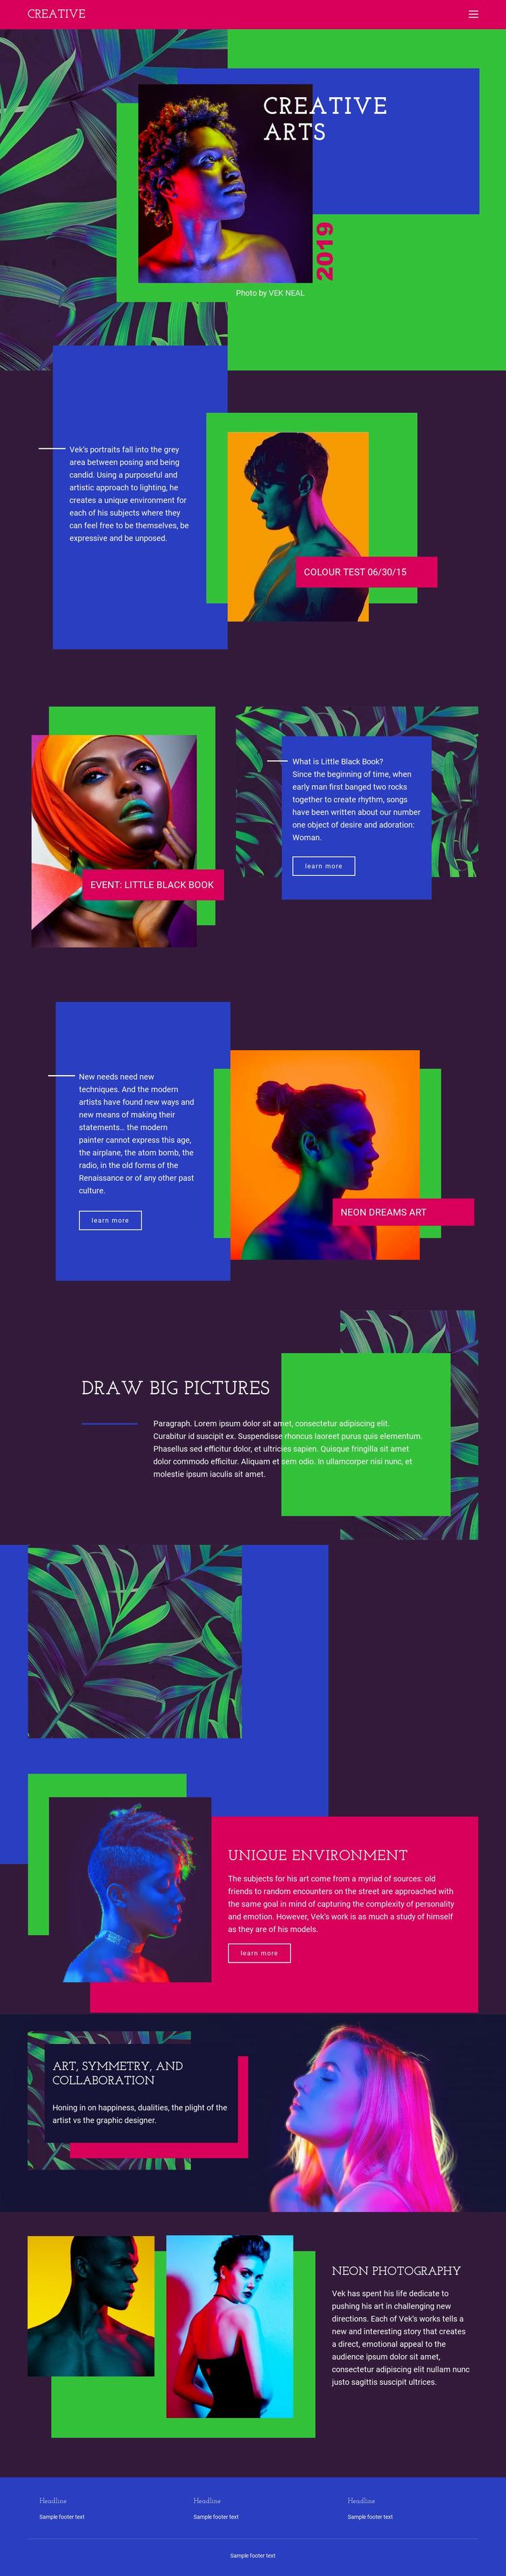 Creative Art Ideas Website Mockup